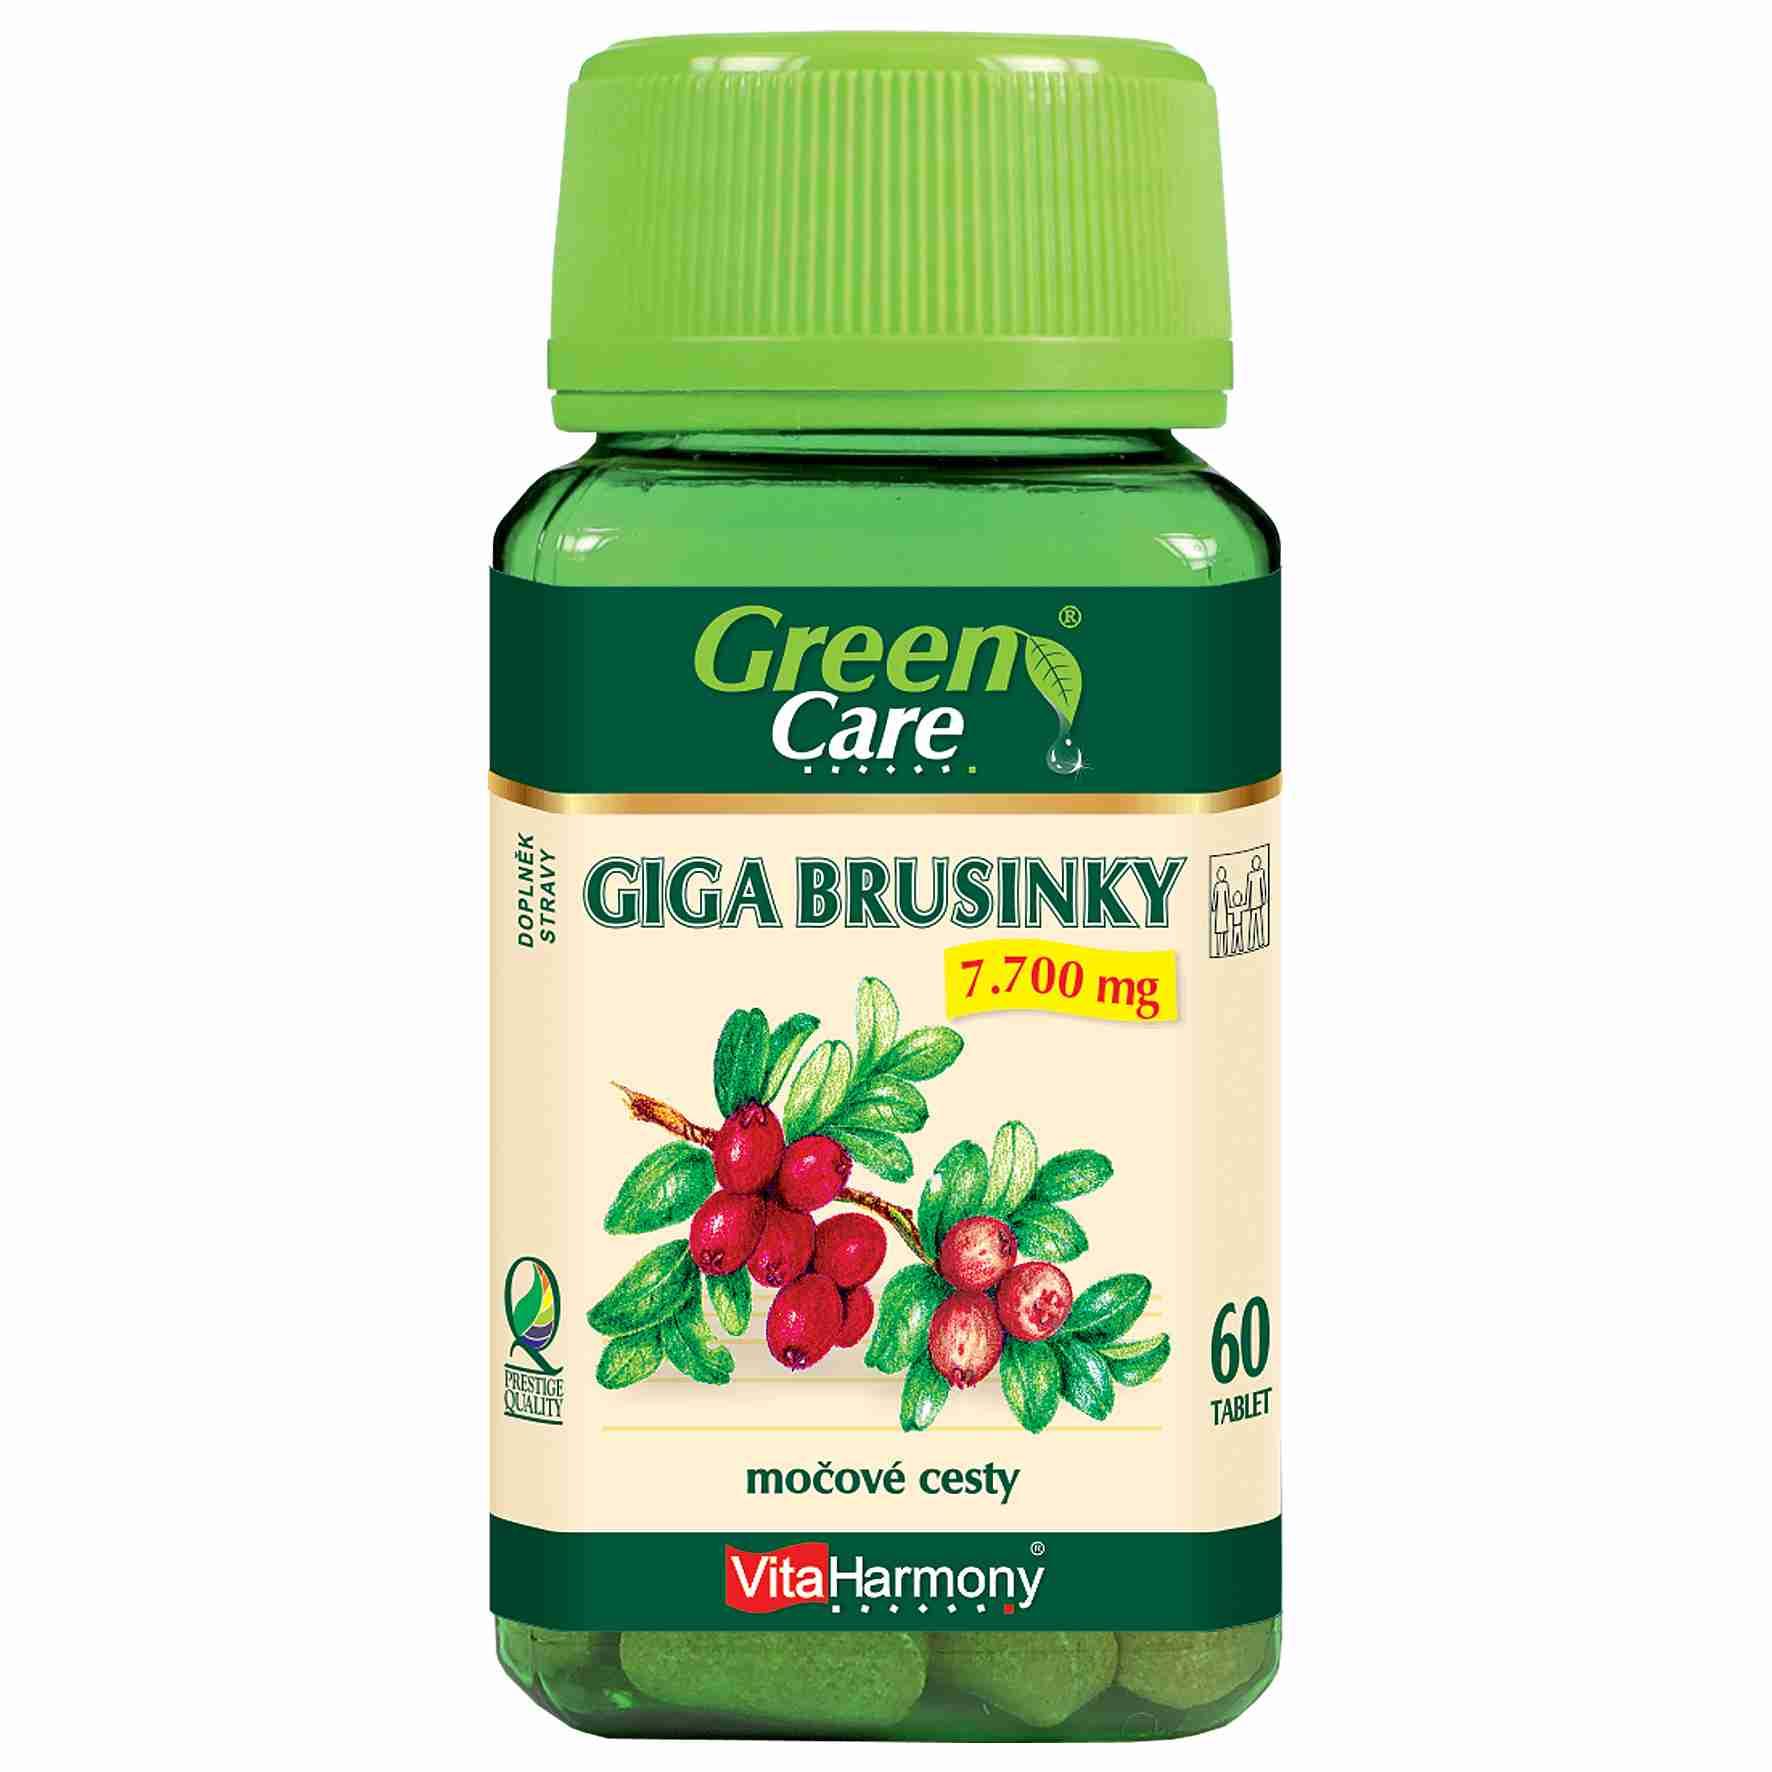 VitaHarmony Giga Brusinky 7.700 mg 60 tbl.